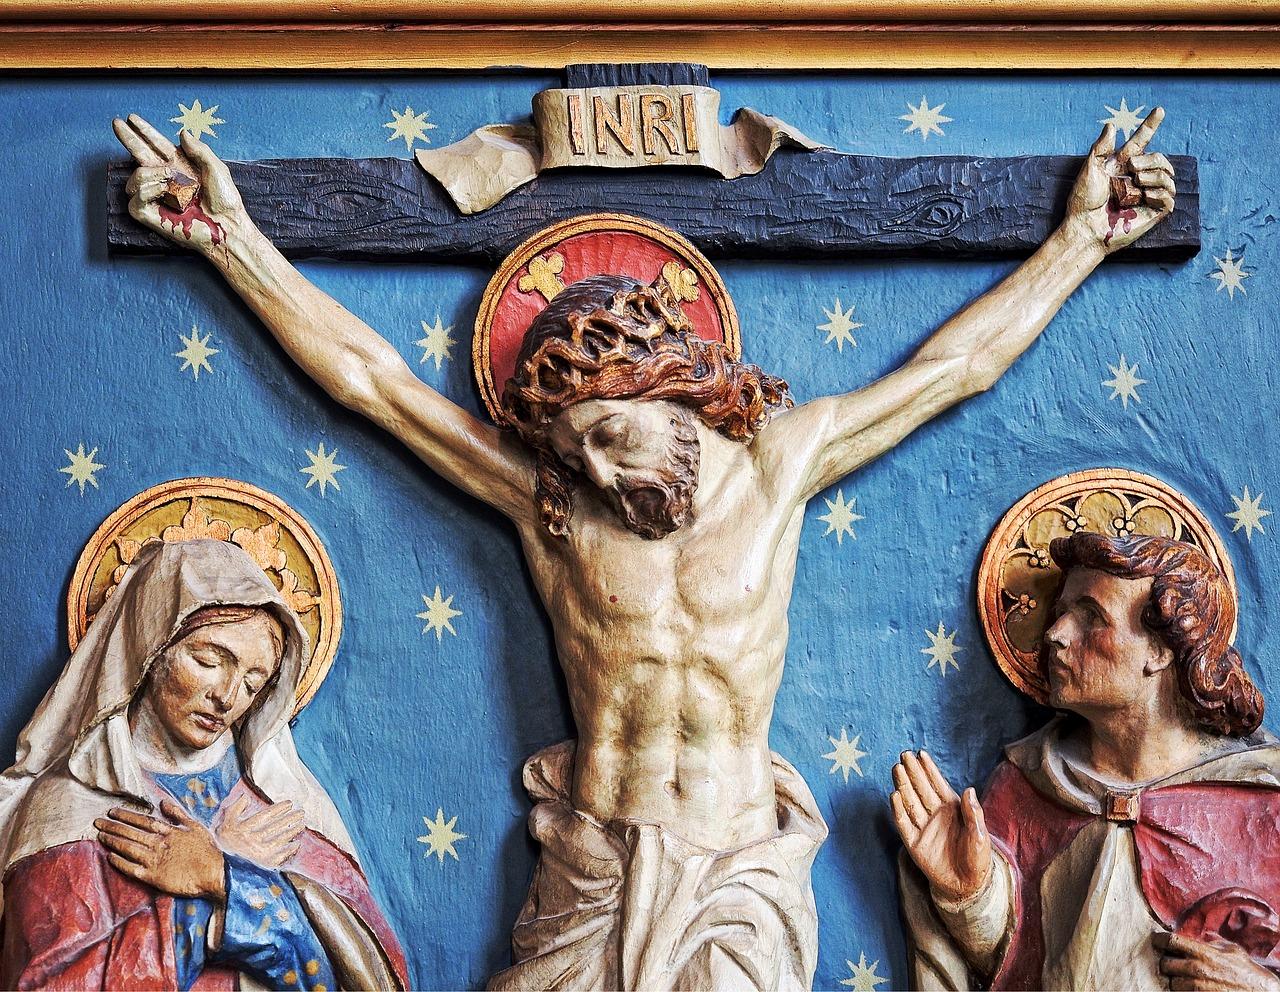 Mary and John at Crucifixion